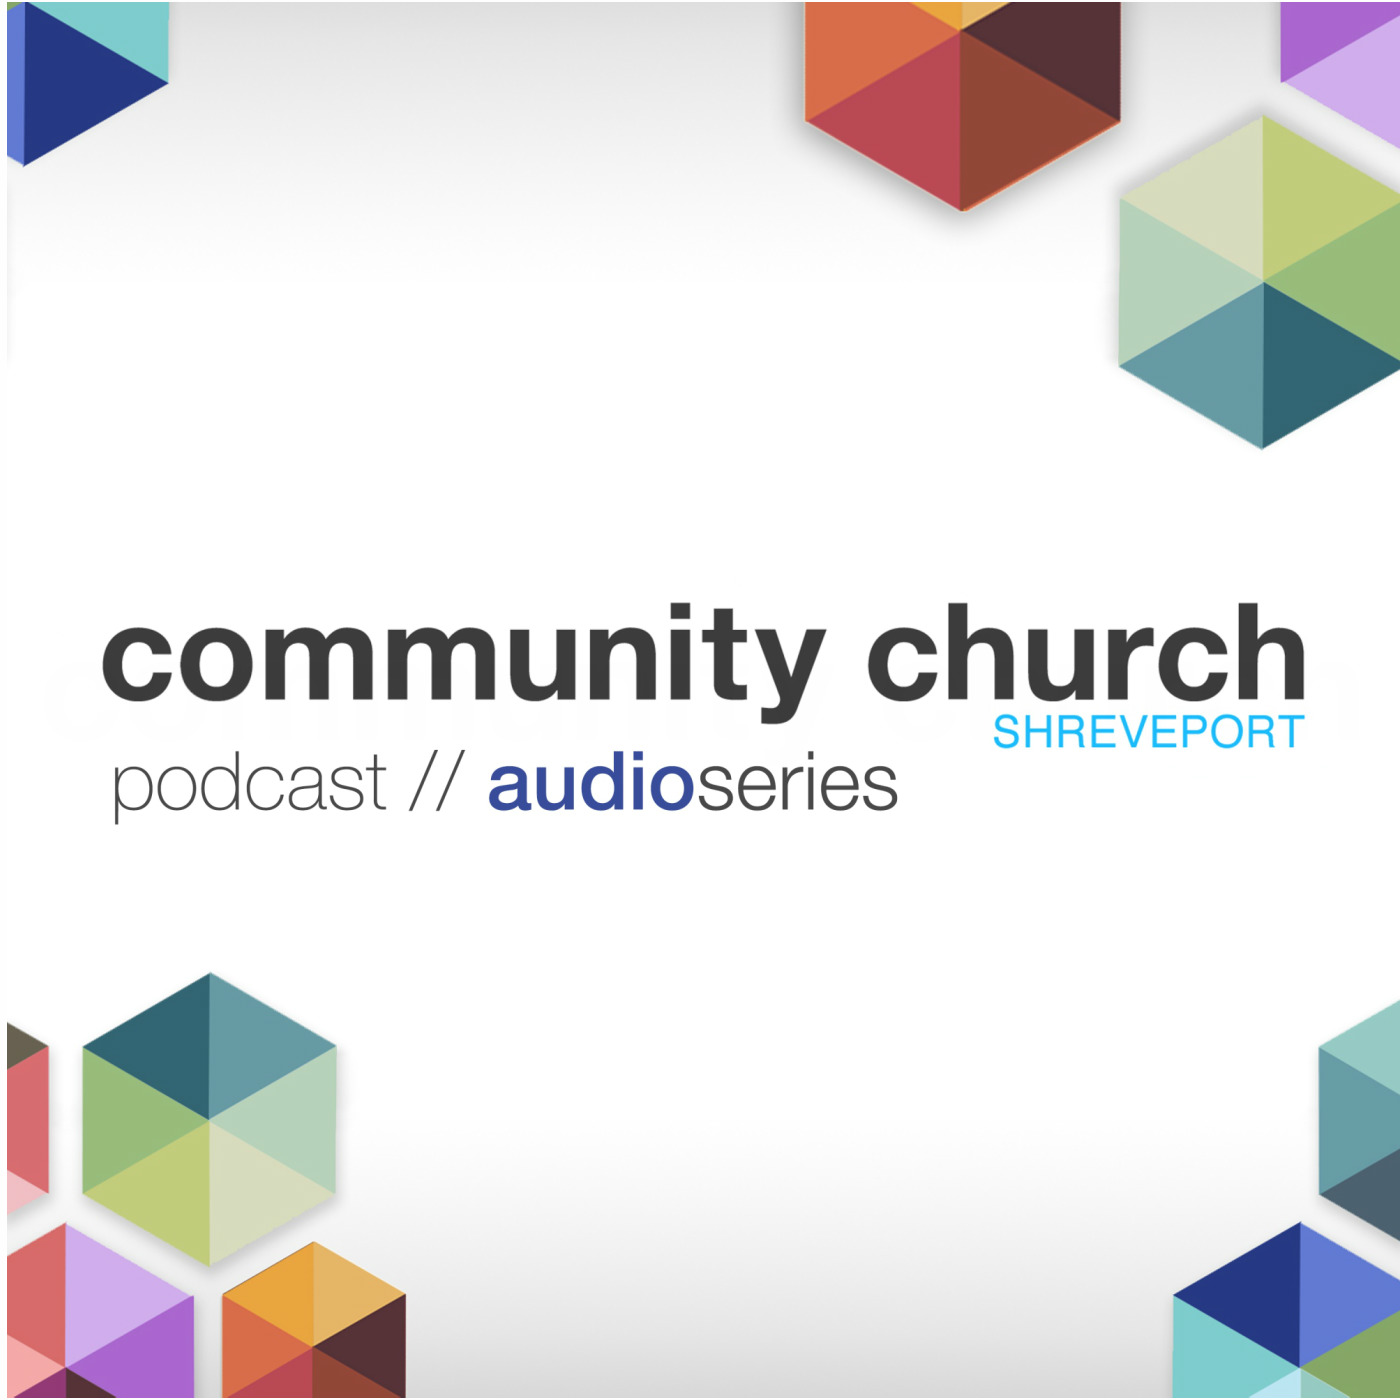 Community Church Shreveport | Audio Series